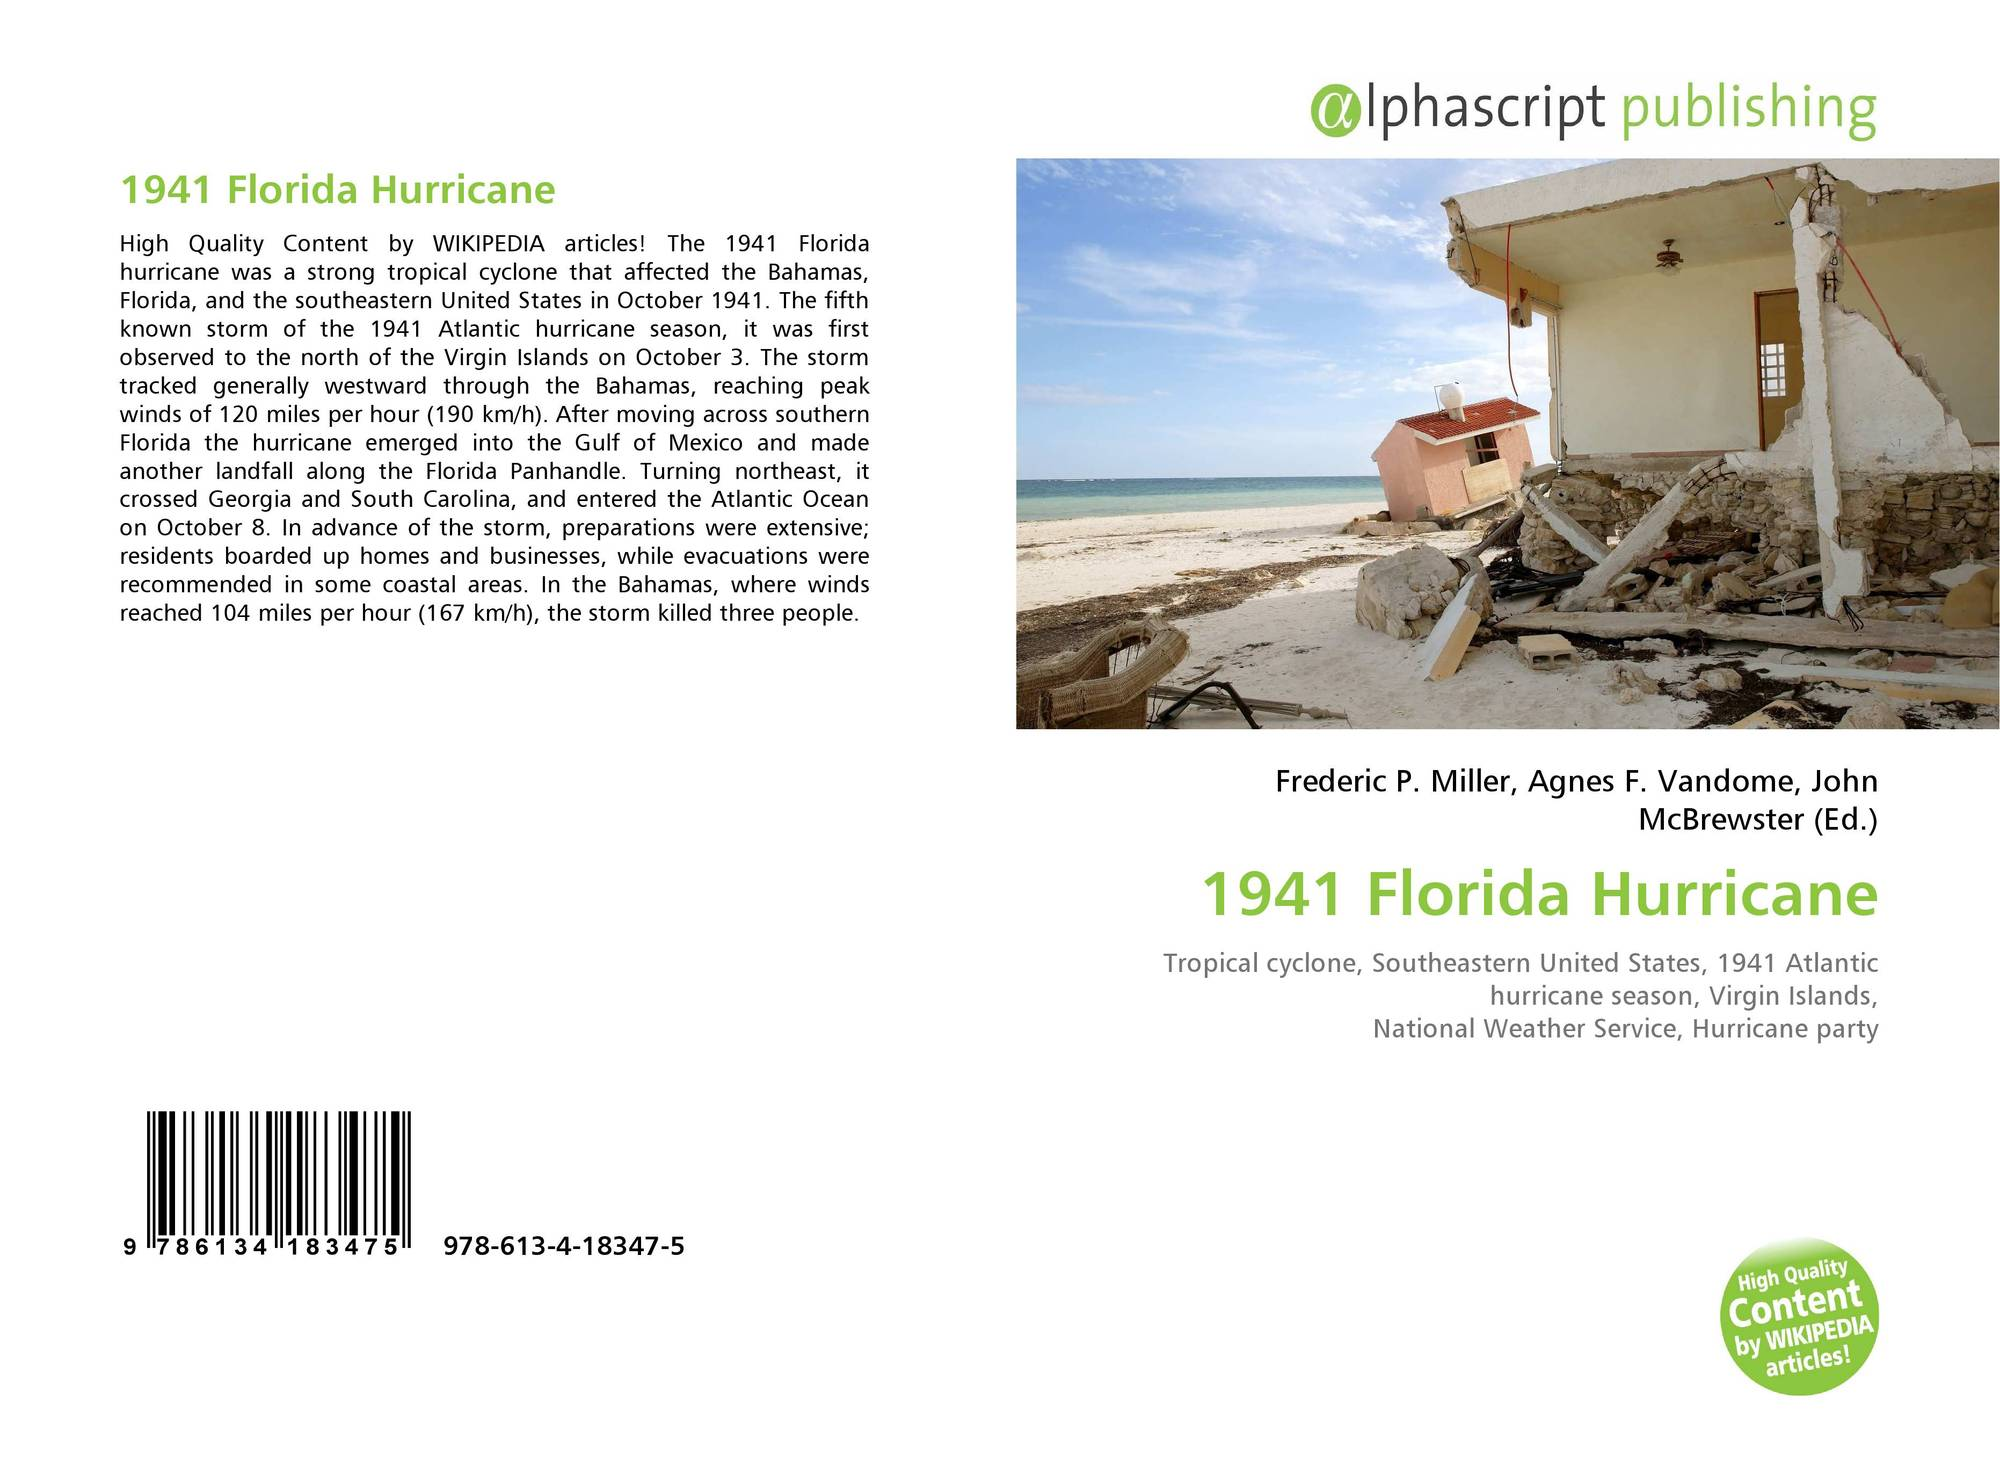 1941 Atlantic hurricane season